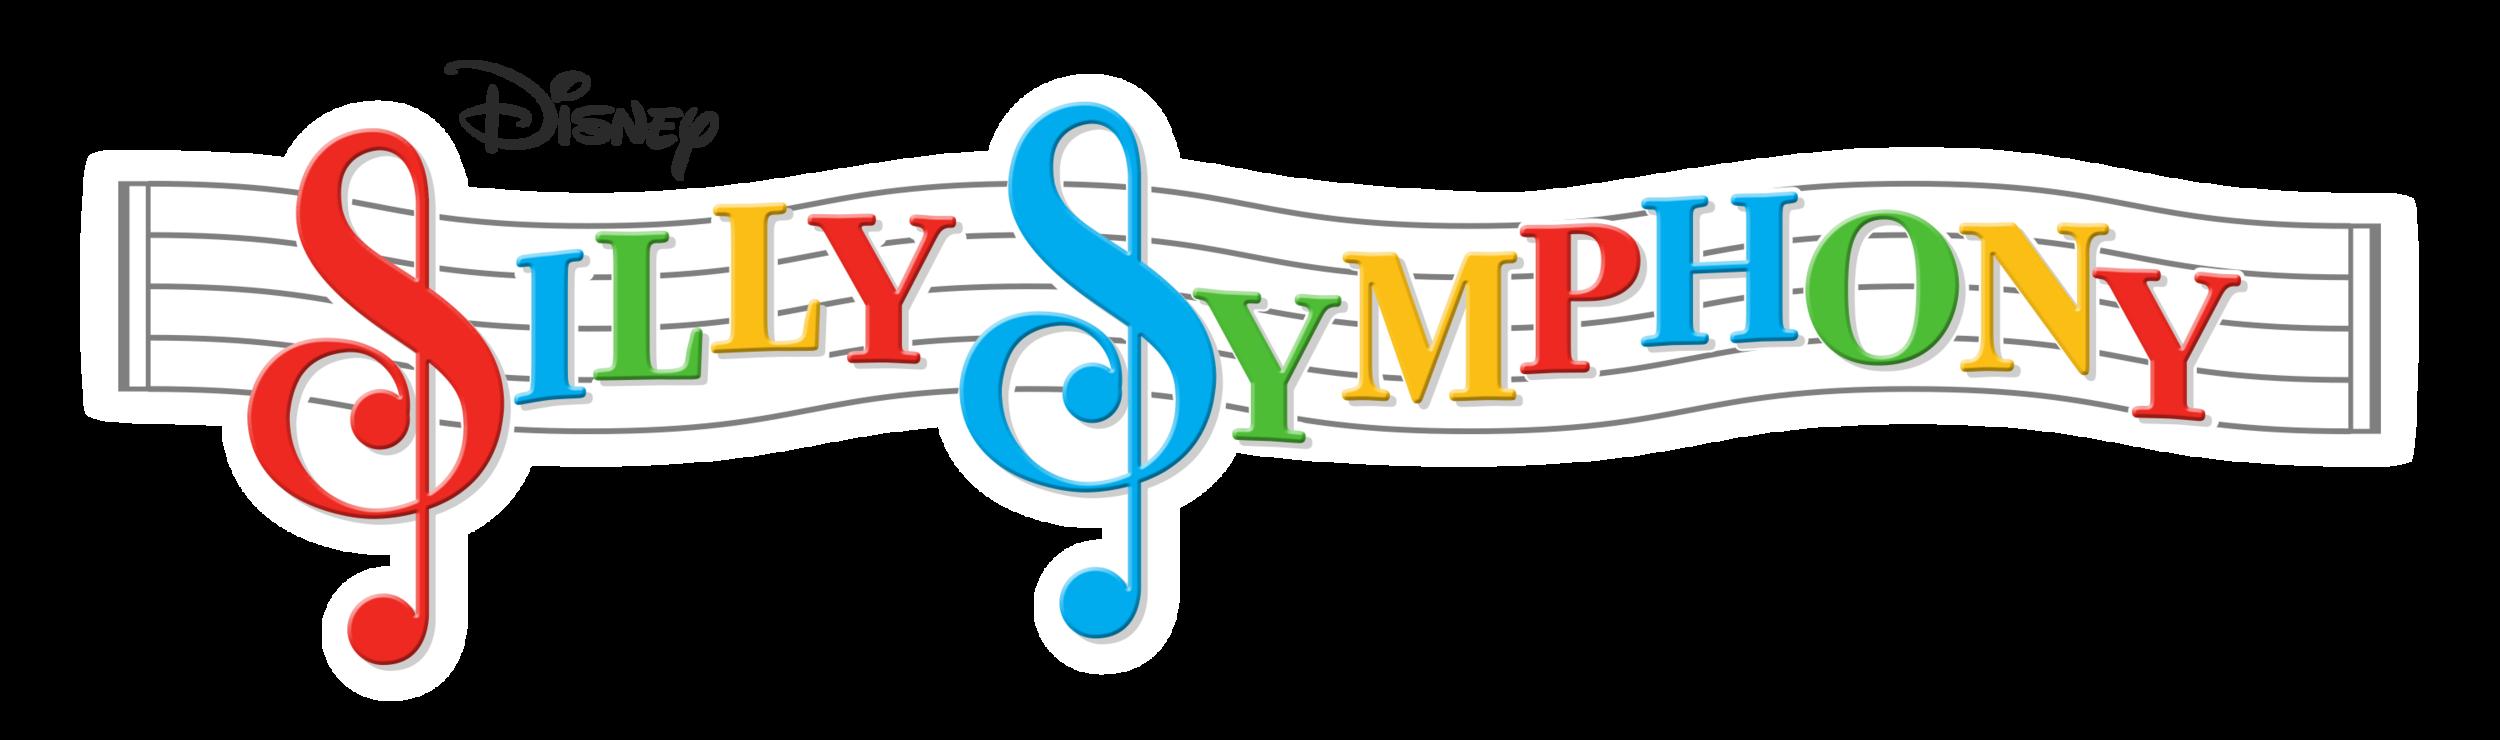 SILLYSYMPHONY_LOGO_FINAL.png